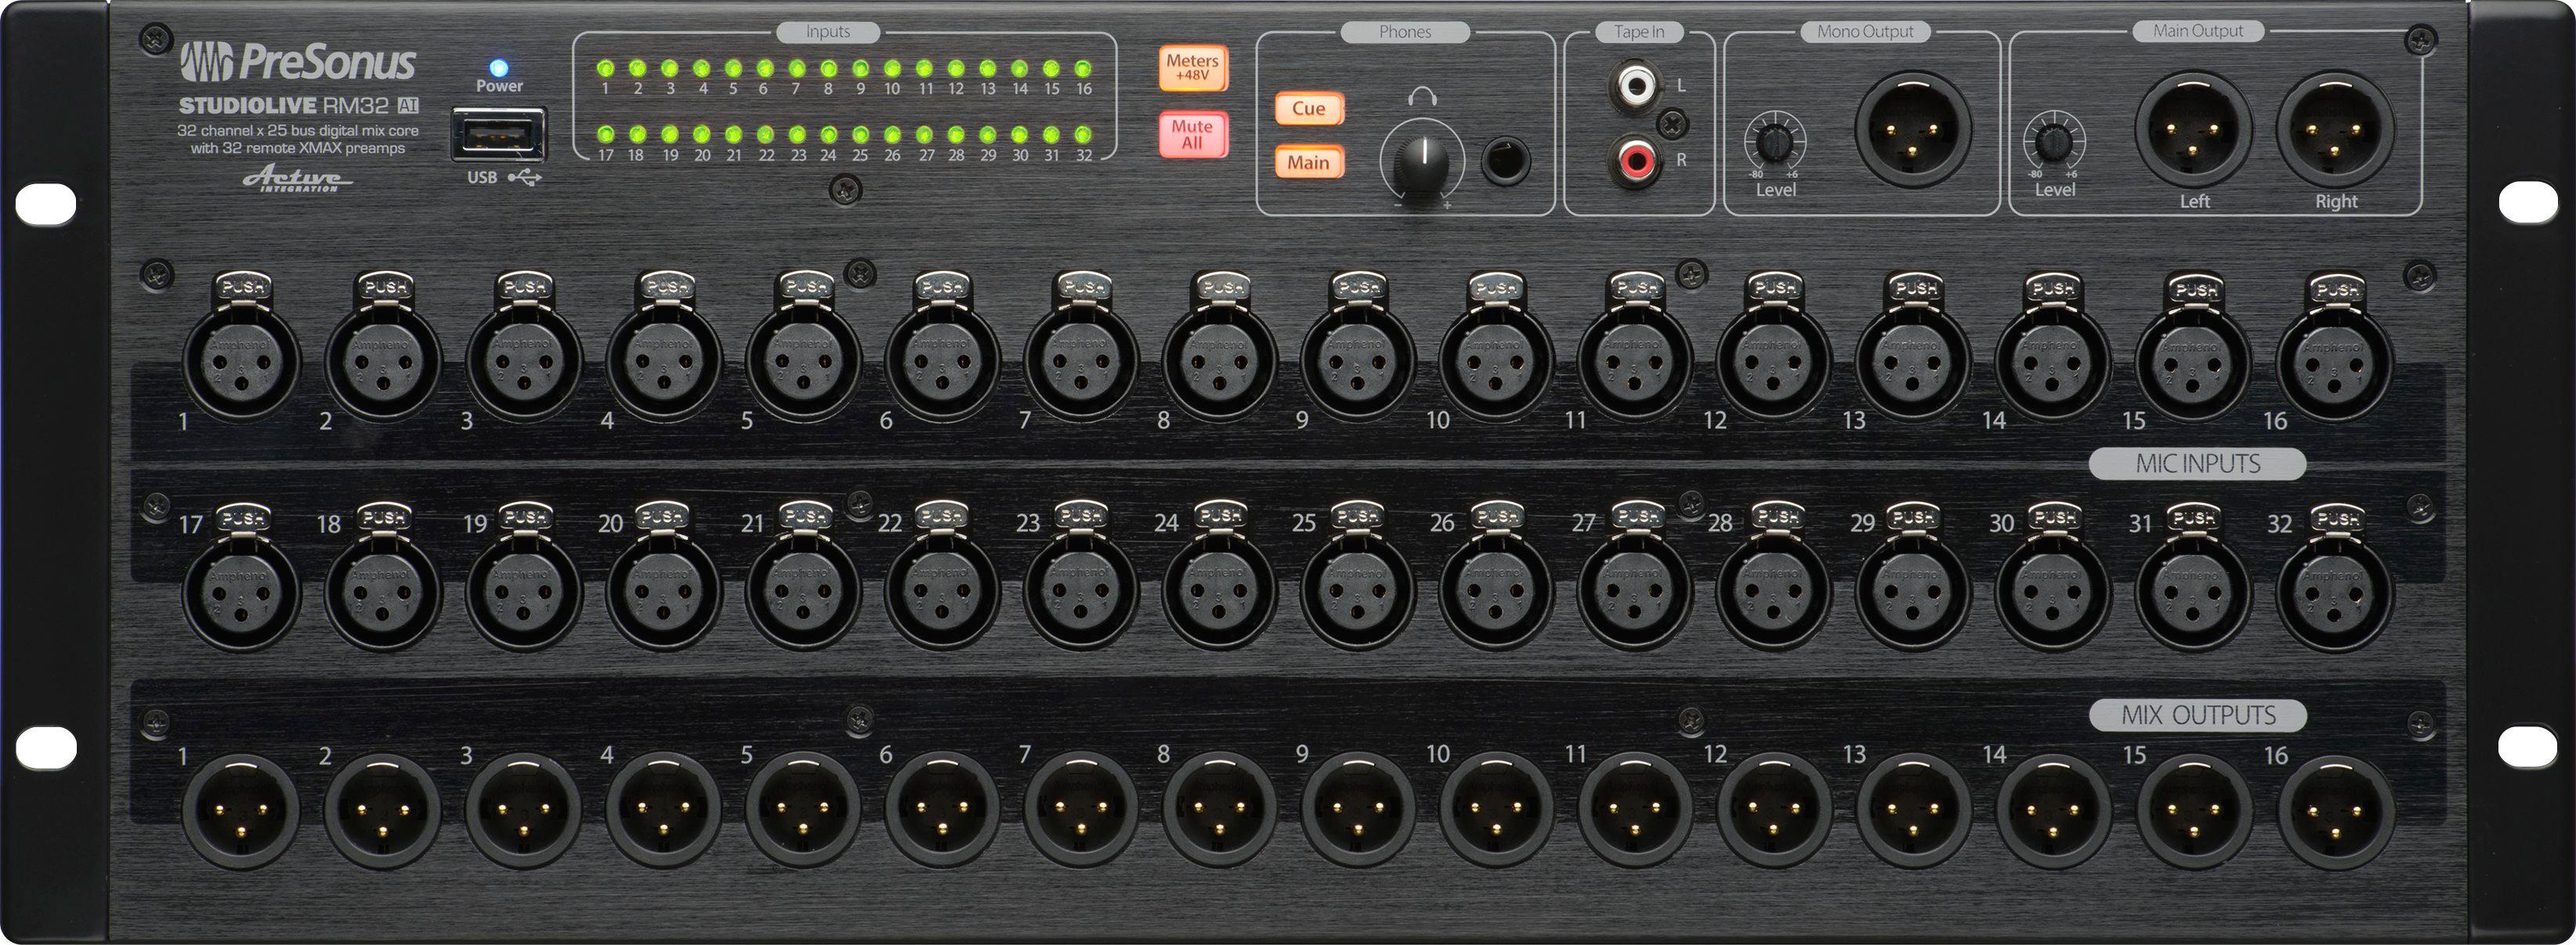 presonus studiolive rm32ai 32 channel touch software controlled digital mixer. Black Bedroom Furniture Sets. Home Design Ideas